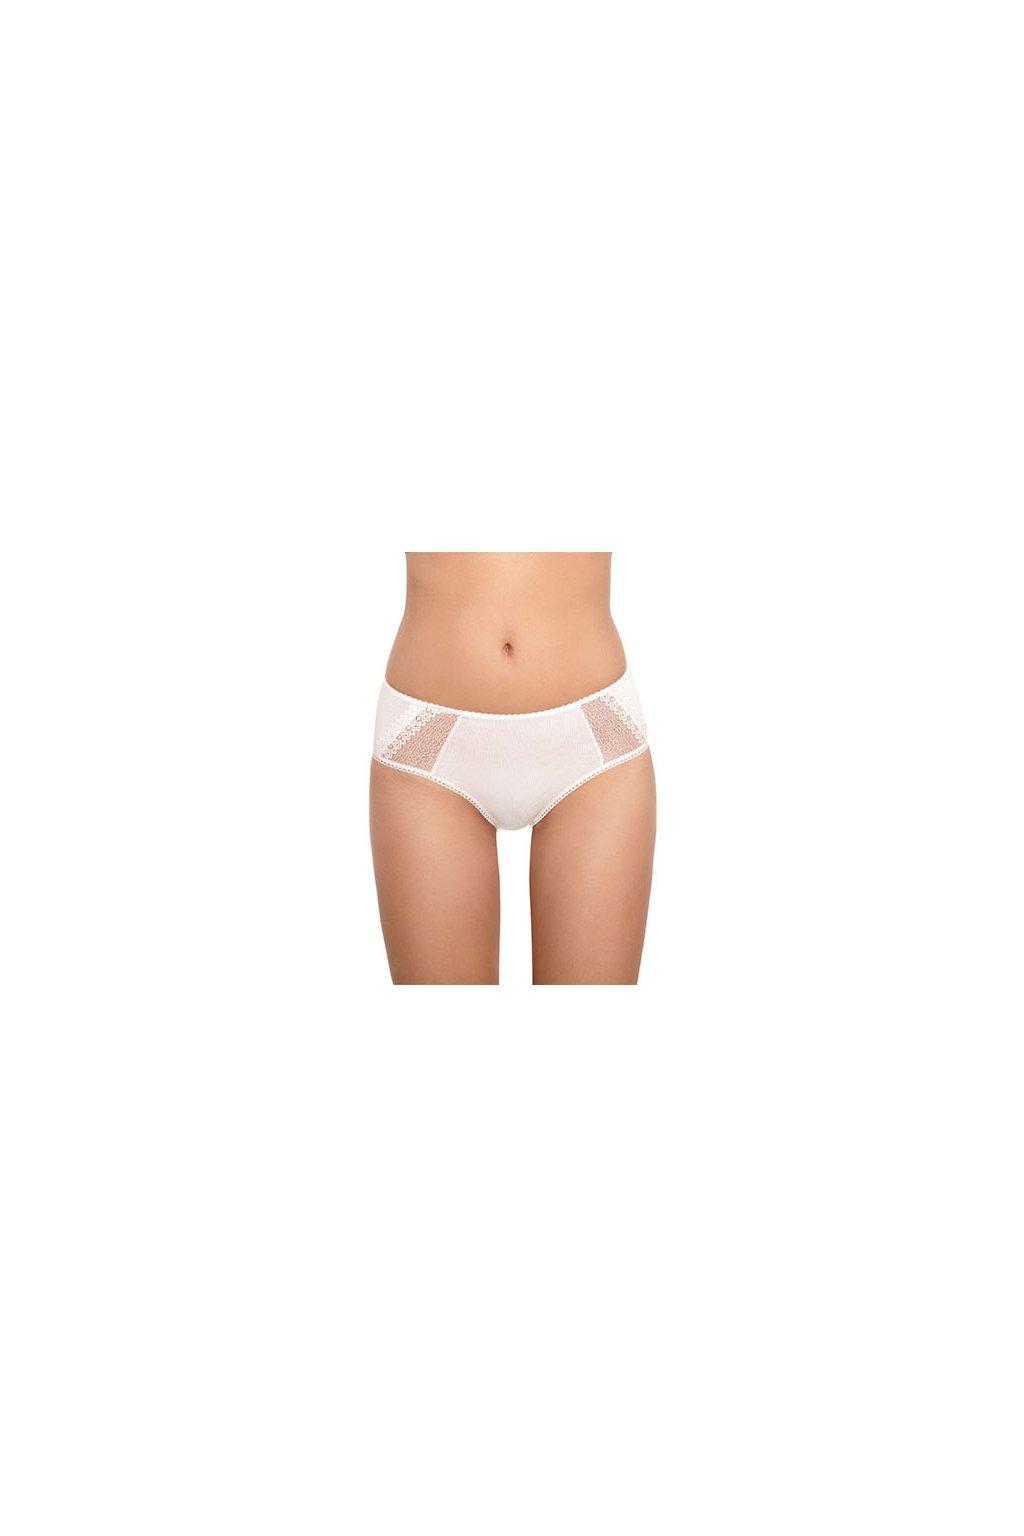 Dámské kalhotky, 100174 346, bílá